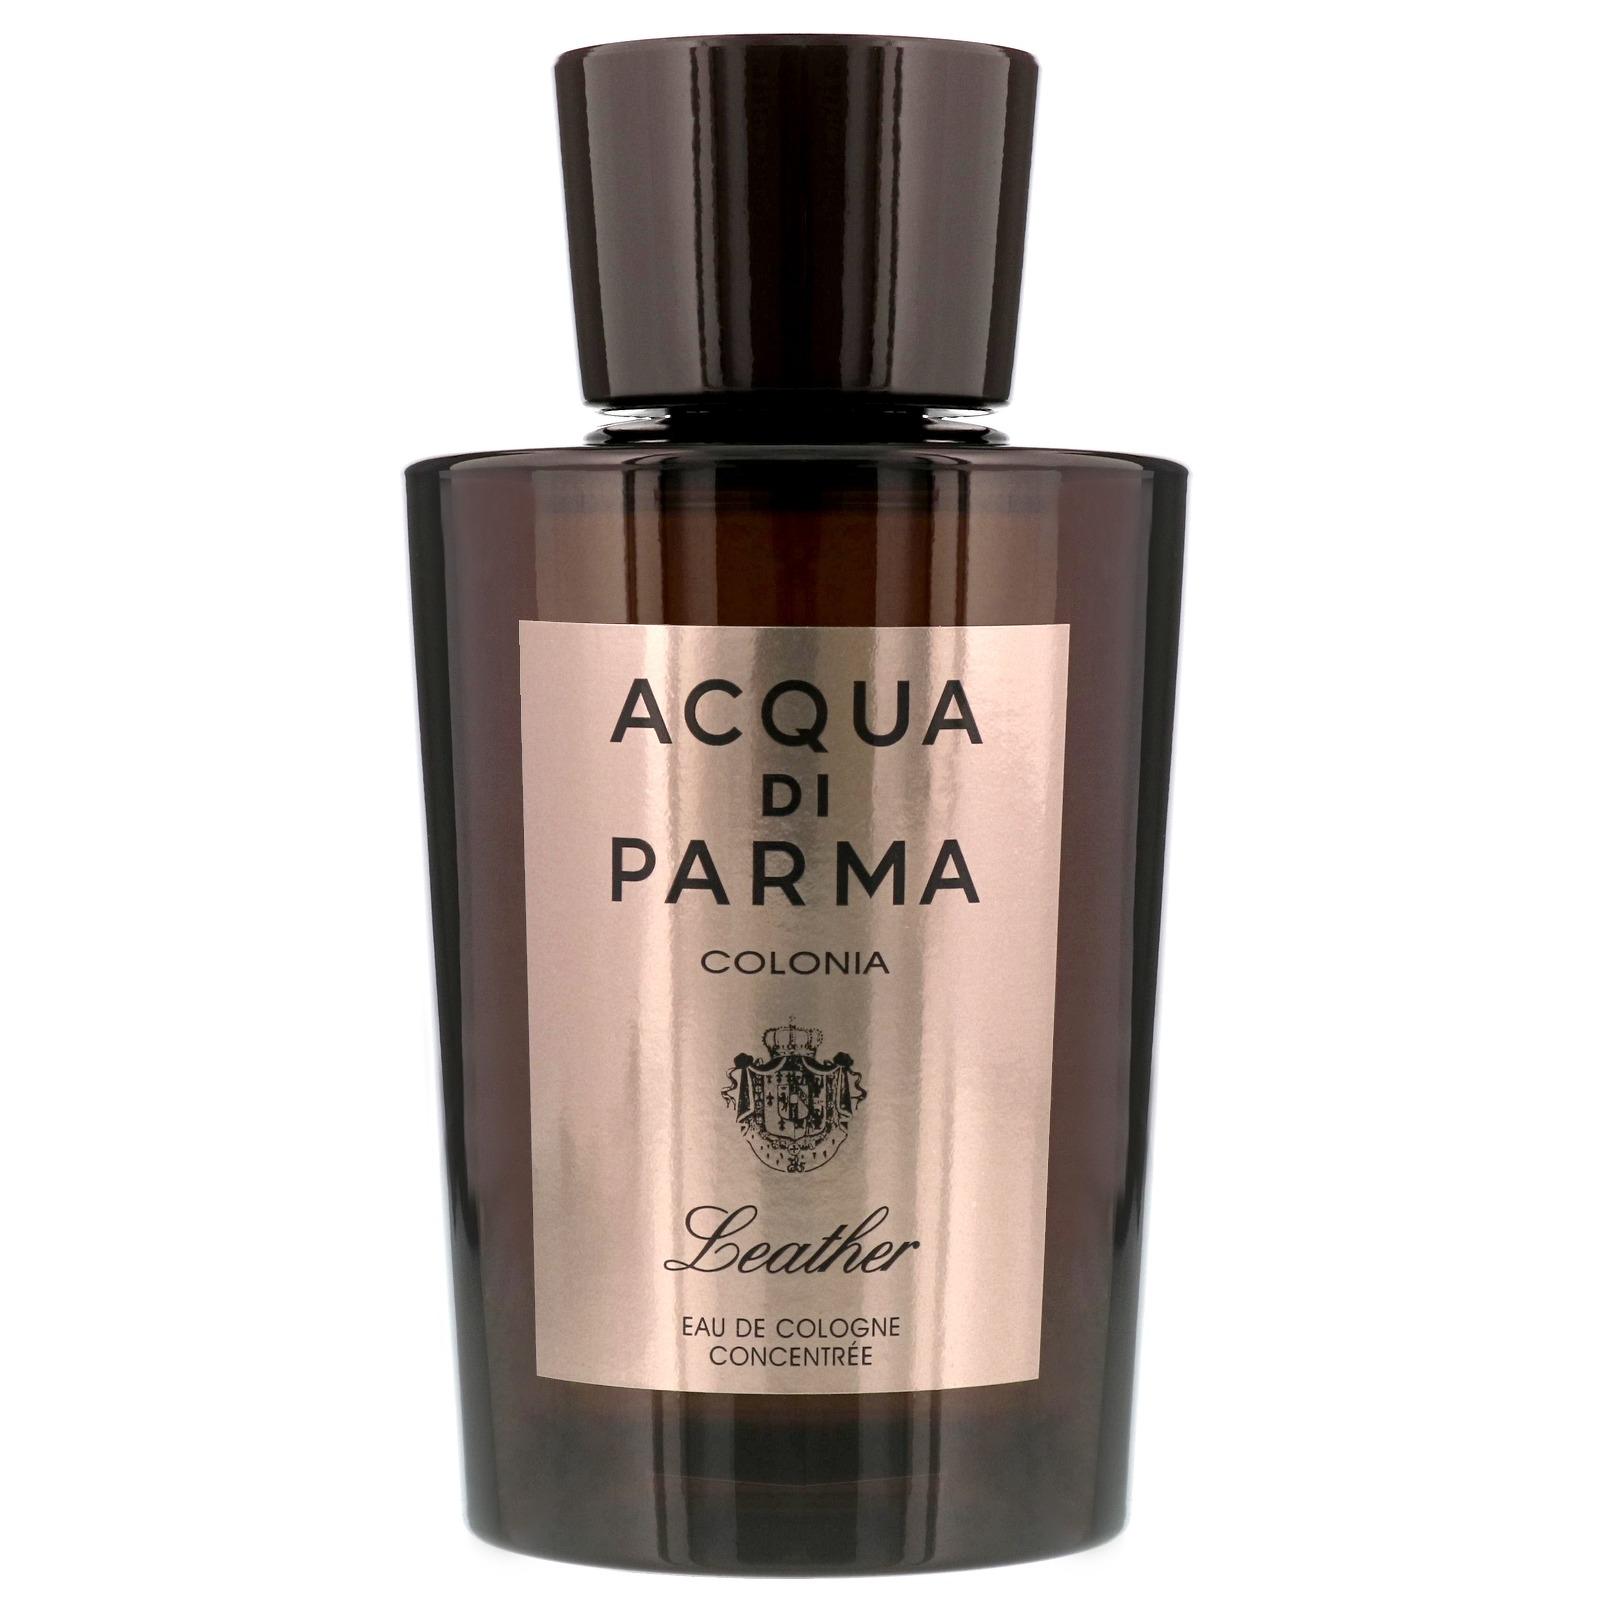 Acqua Di Parma Colonia Leather 180ml £94.45 with code @ All Beauty